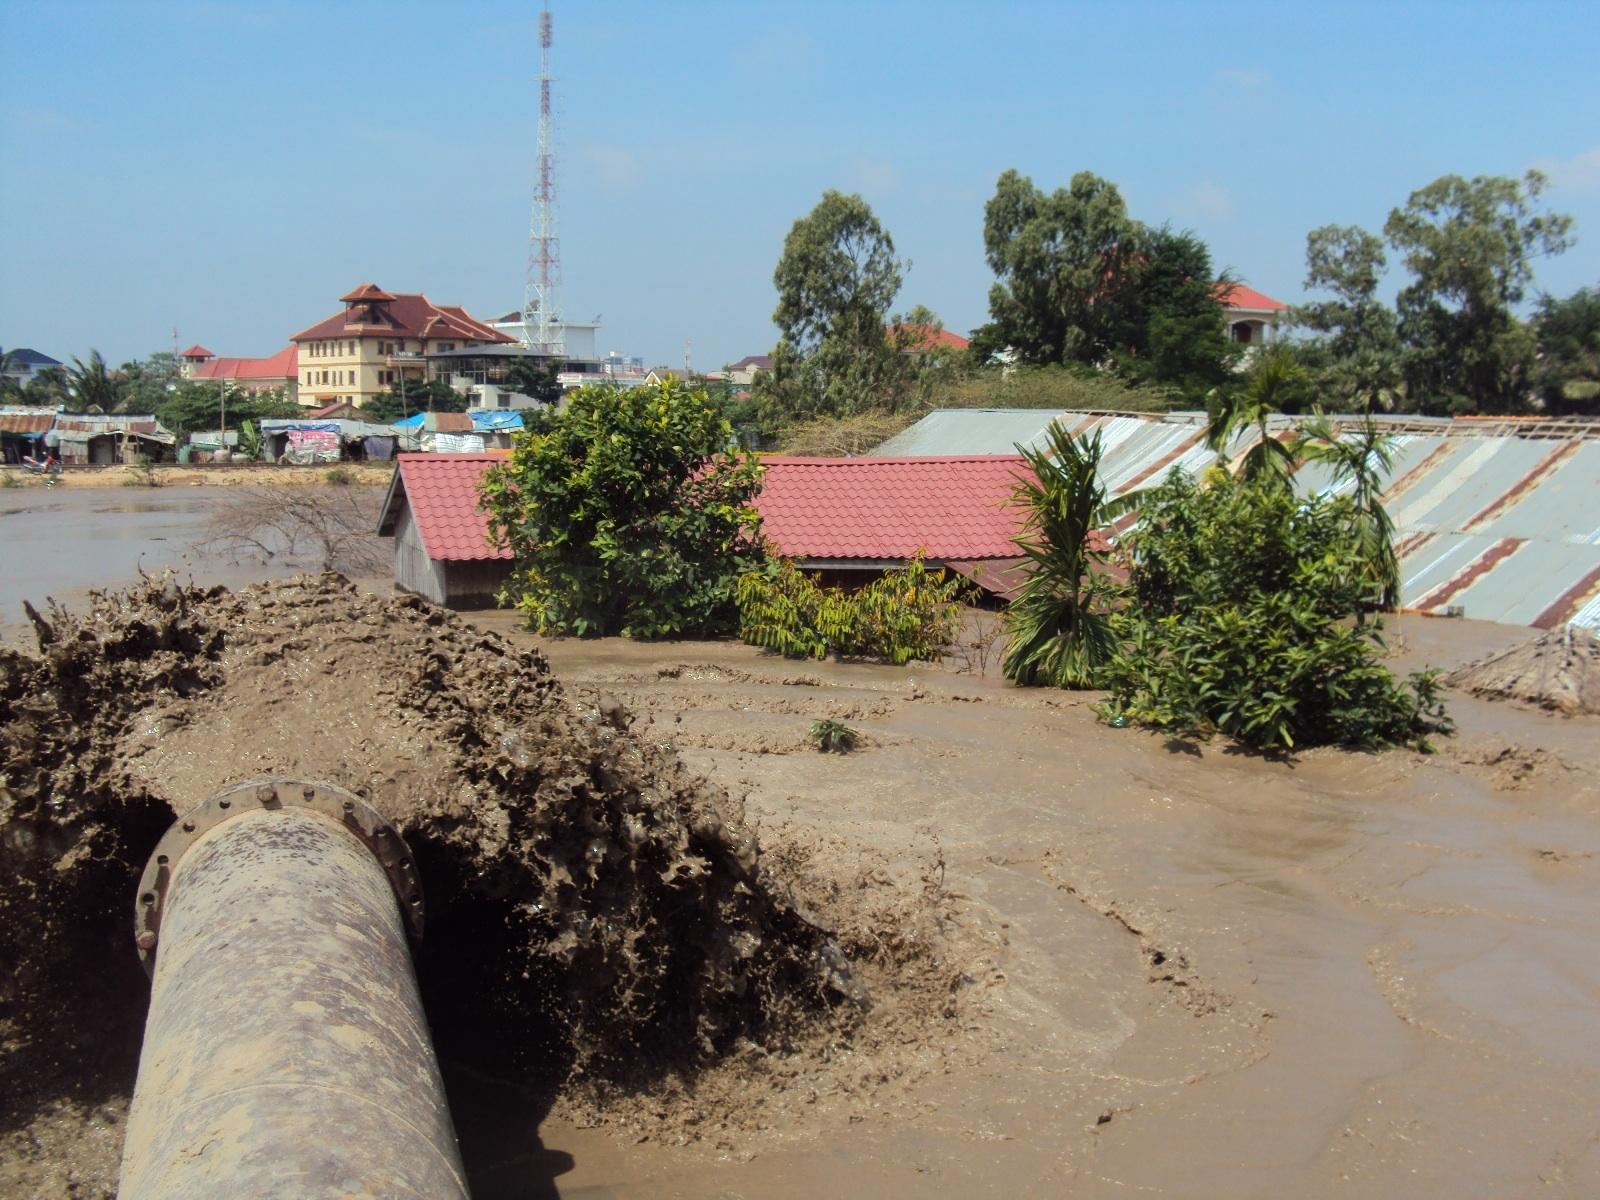 Boeung Kak Lake Phnom Penh Zero Evictions Alert